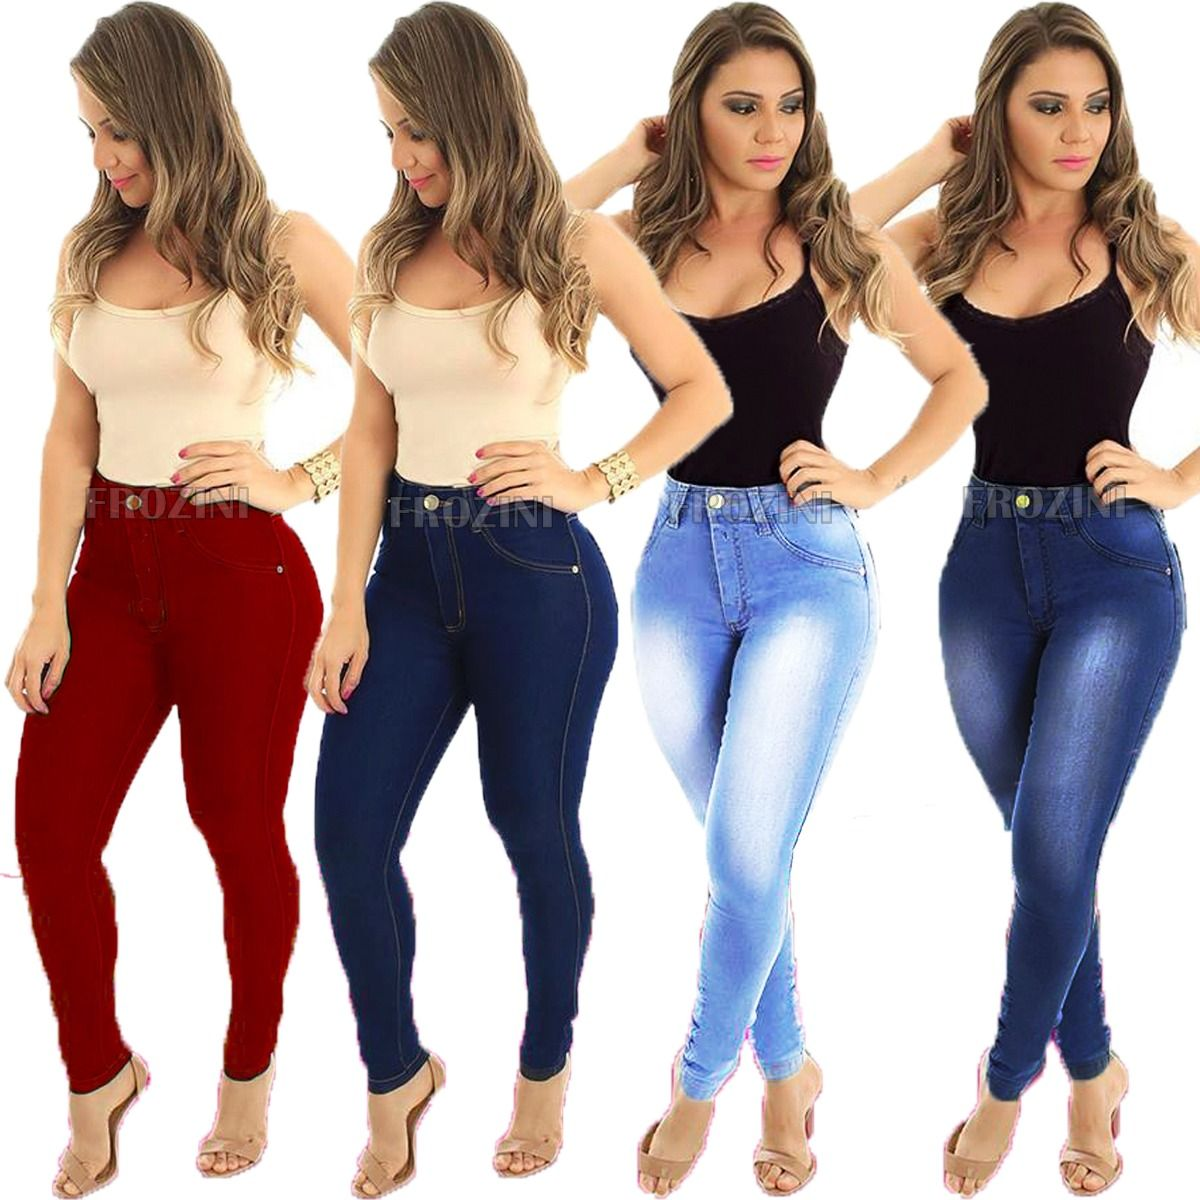 516056091 kit 5 calças jeans feminina cintura alta hot pants atacado